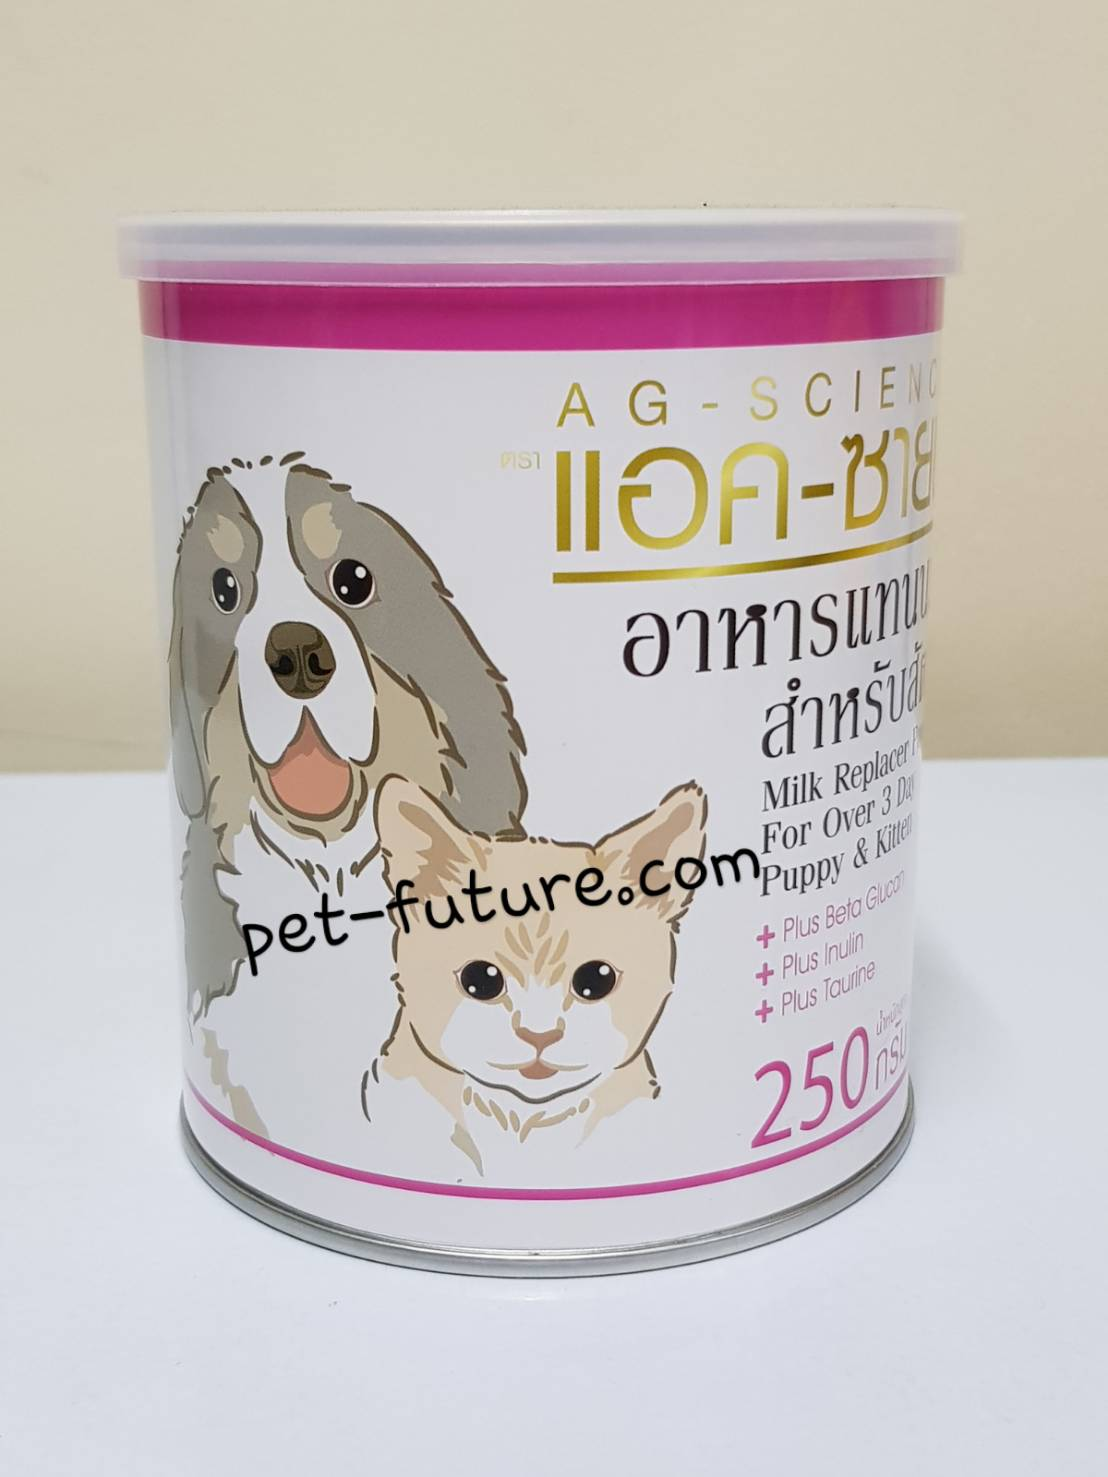 AG-SCIENCE แอค-ซาชน์ สำหรับลูกสุนัขและลูกแมวค่ะ (Exp. 01/20)